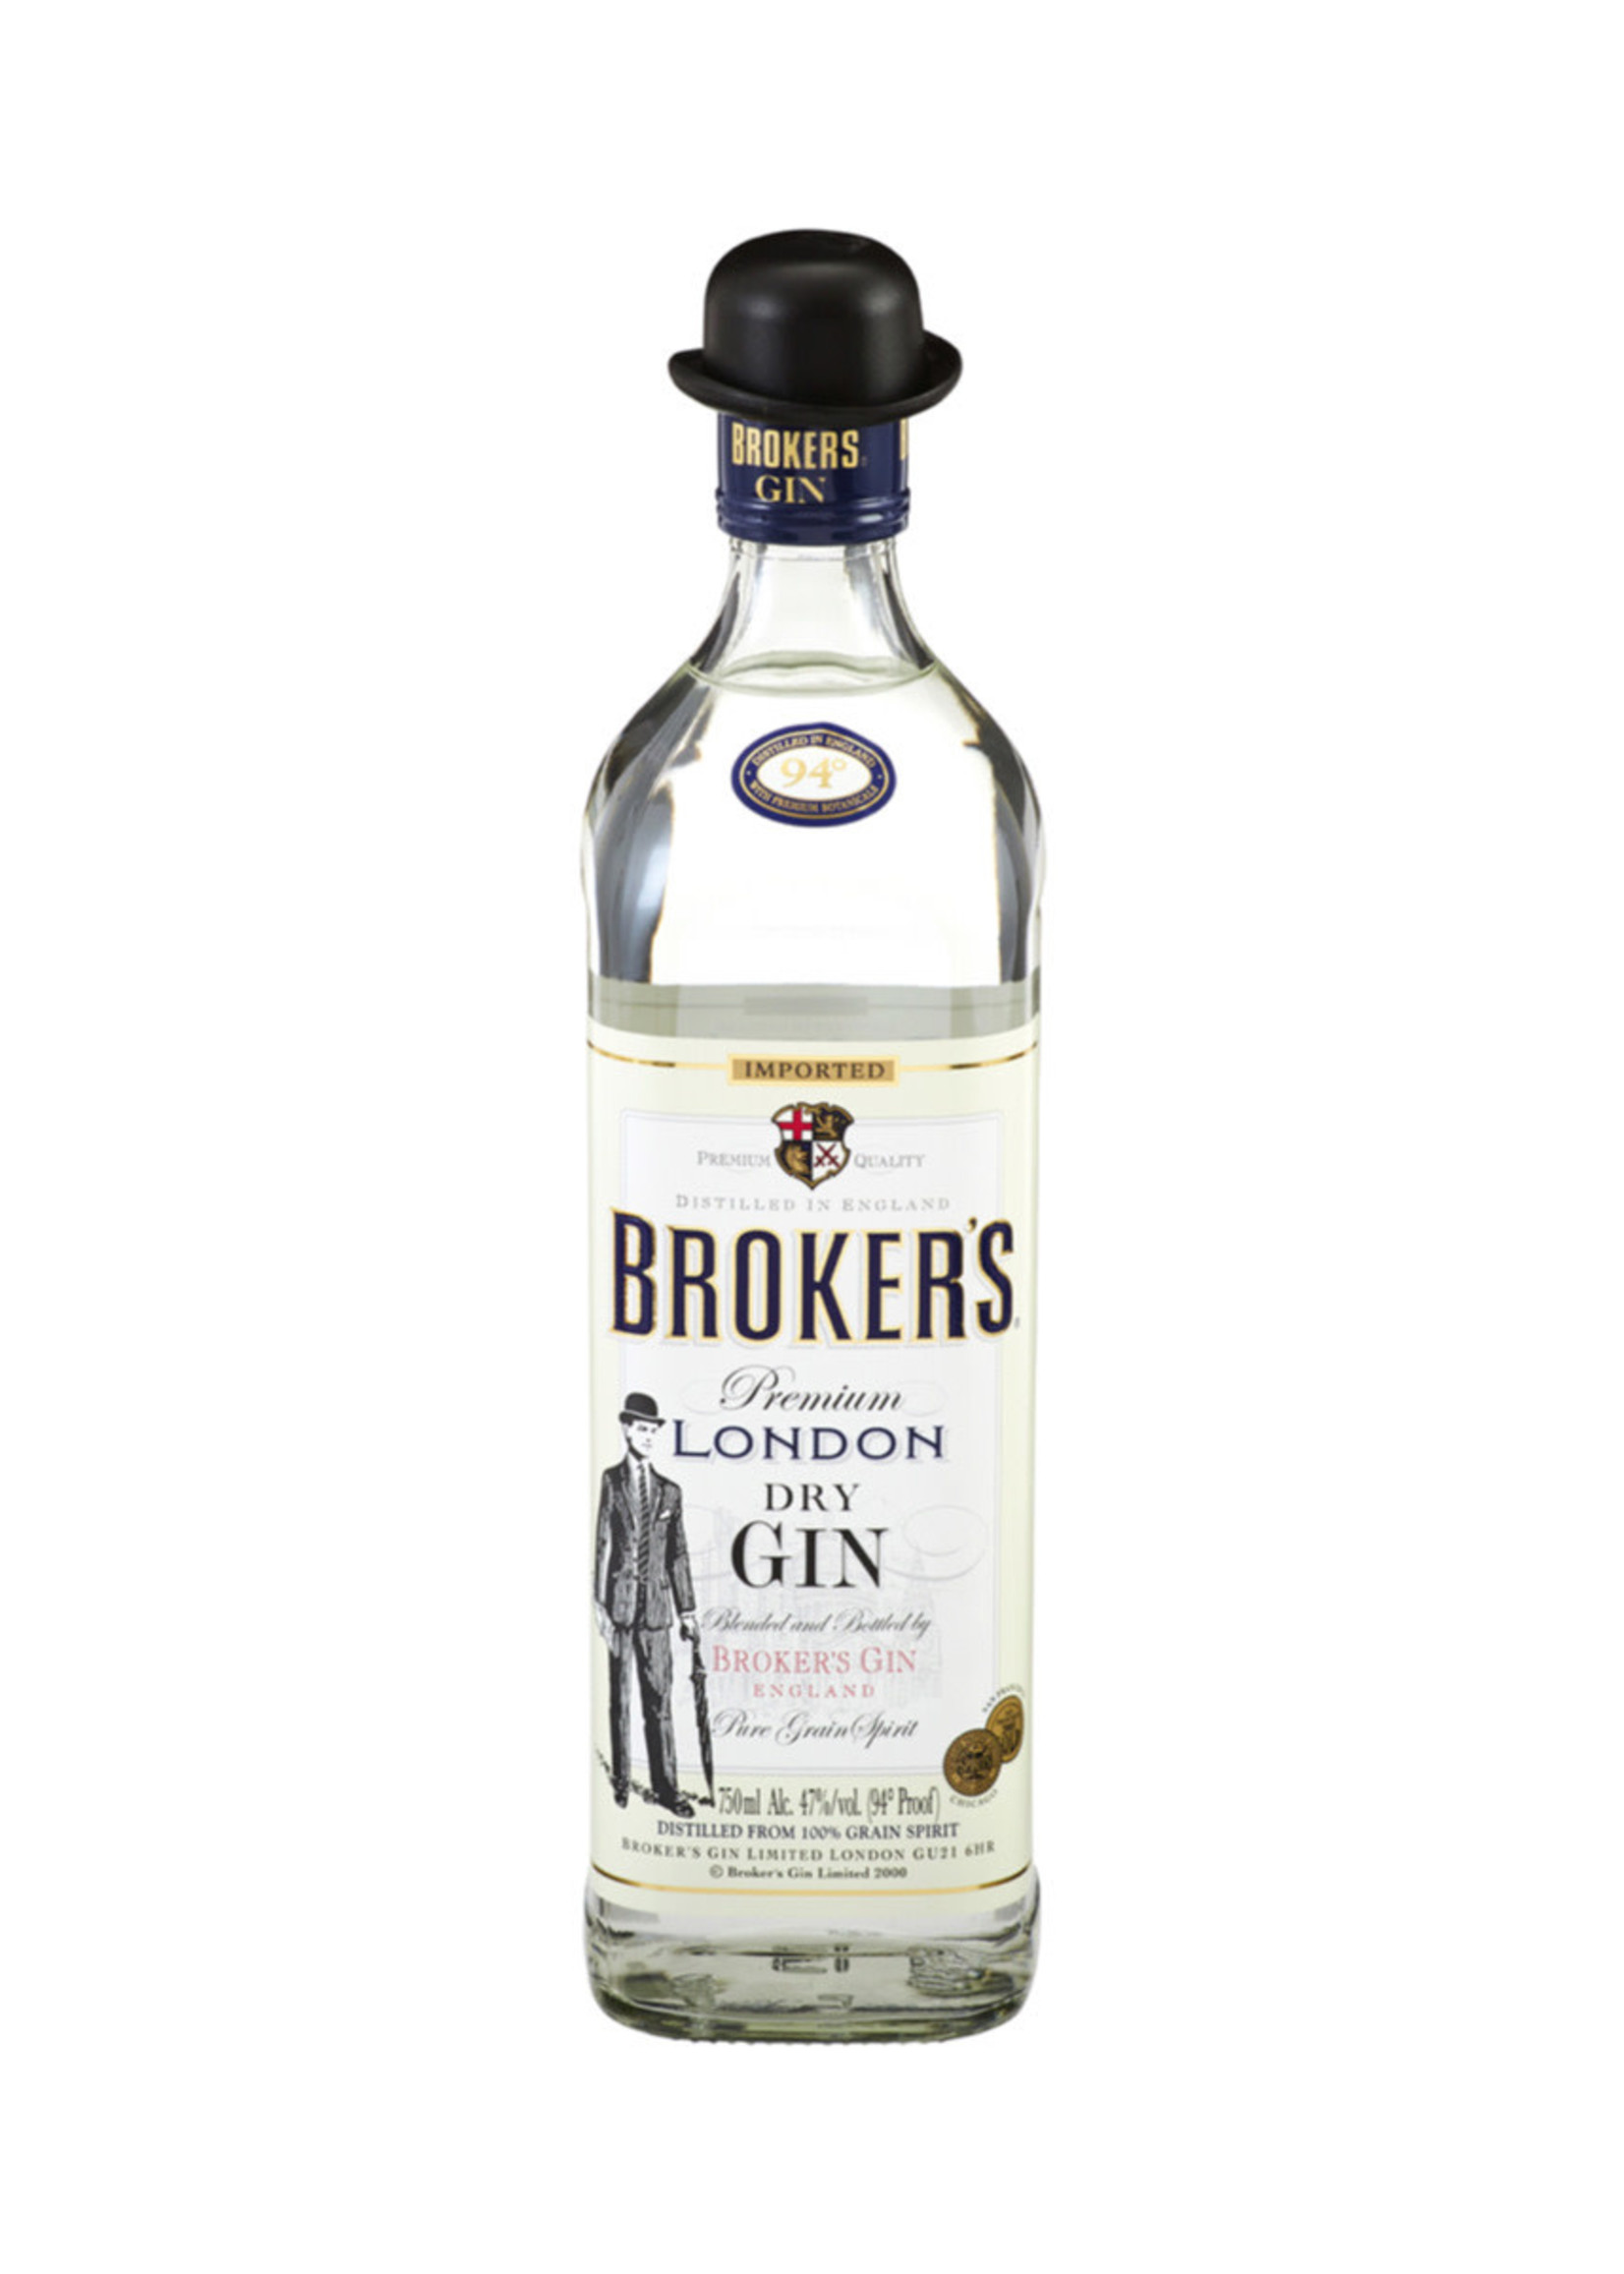 Brokers Gin 1 Liter